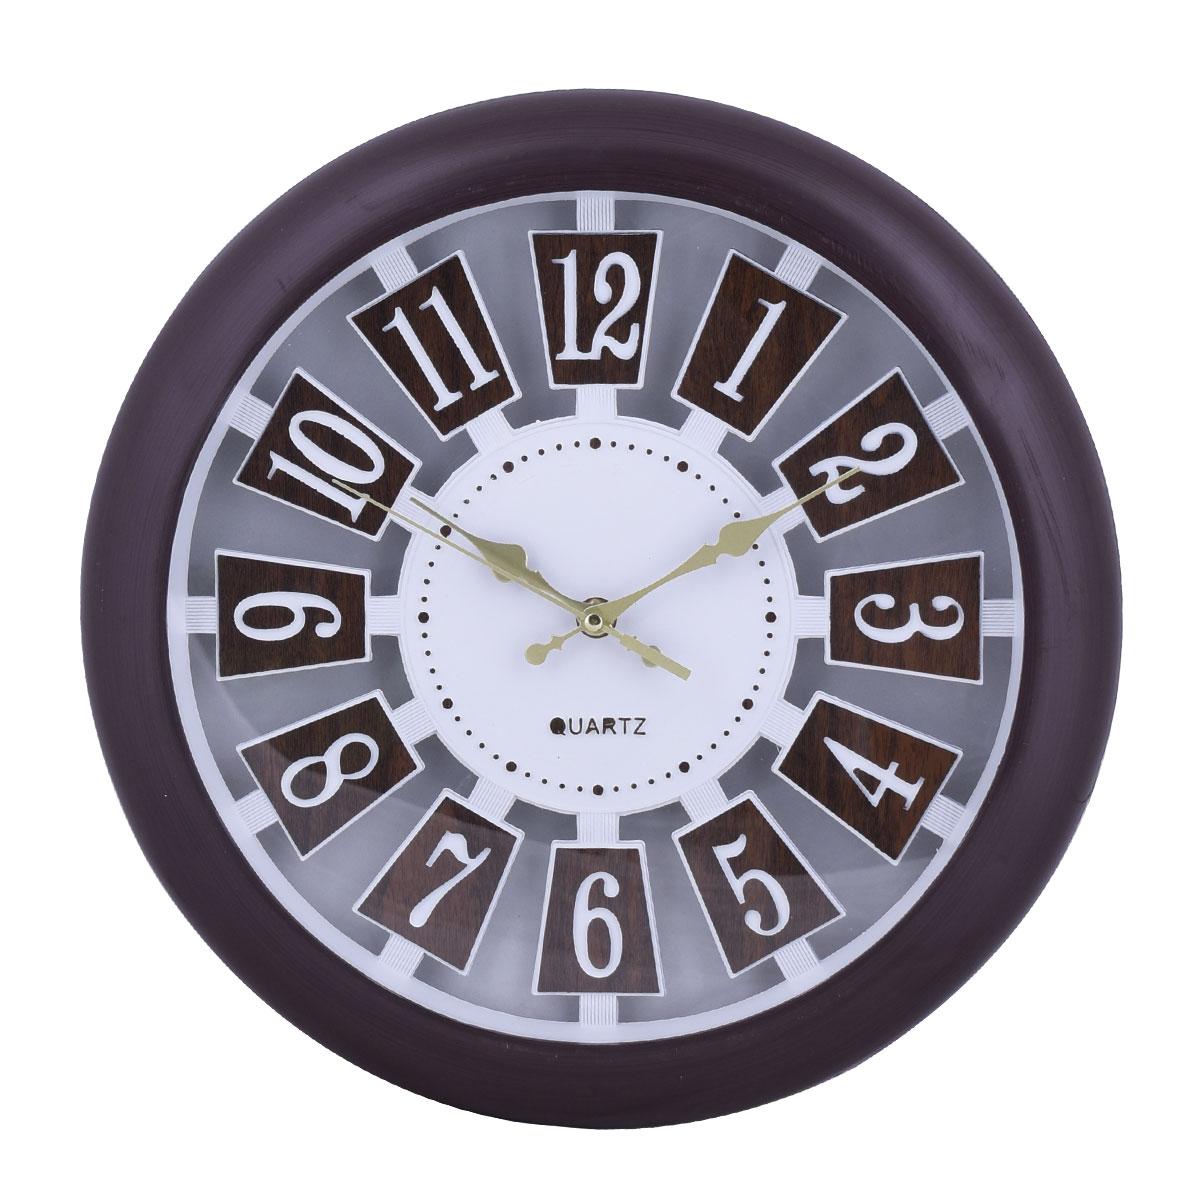 ساعة حائط  دائرية الشكل رقم 2201011